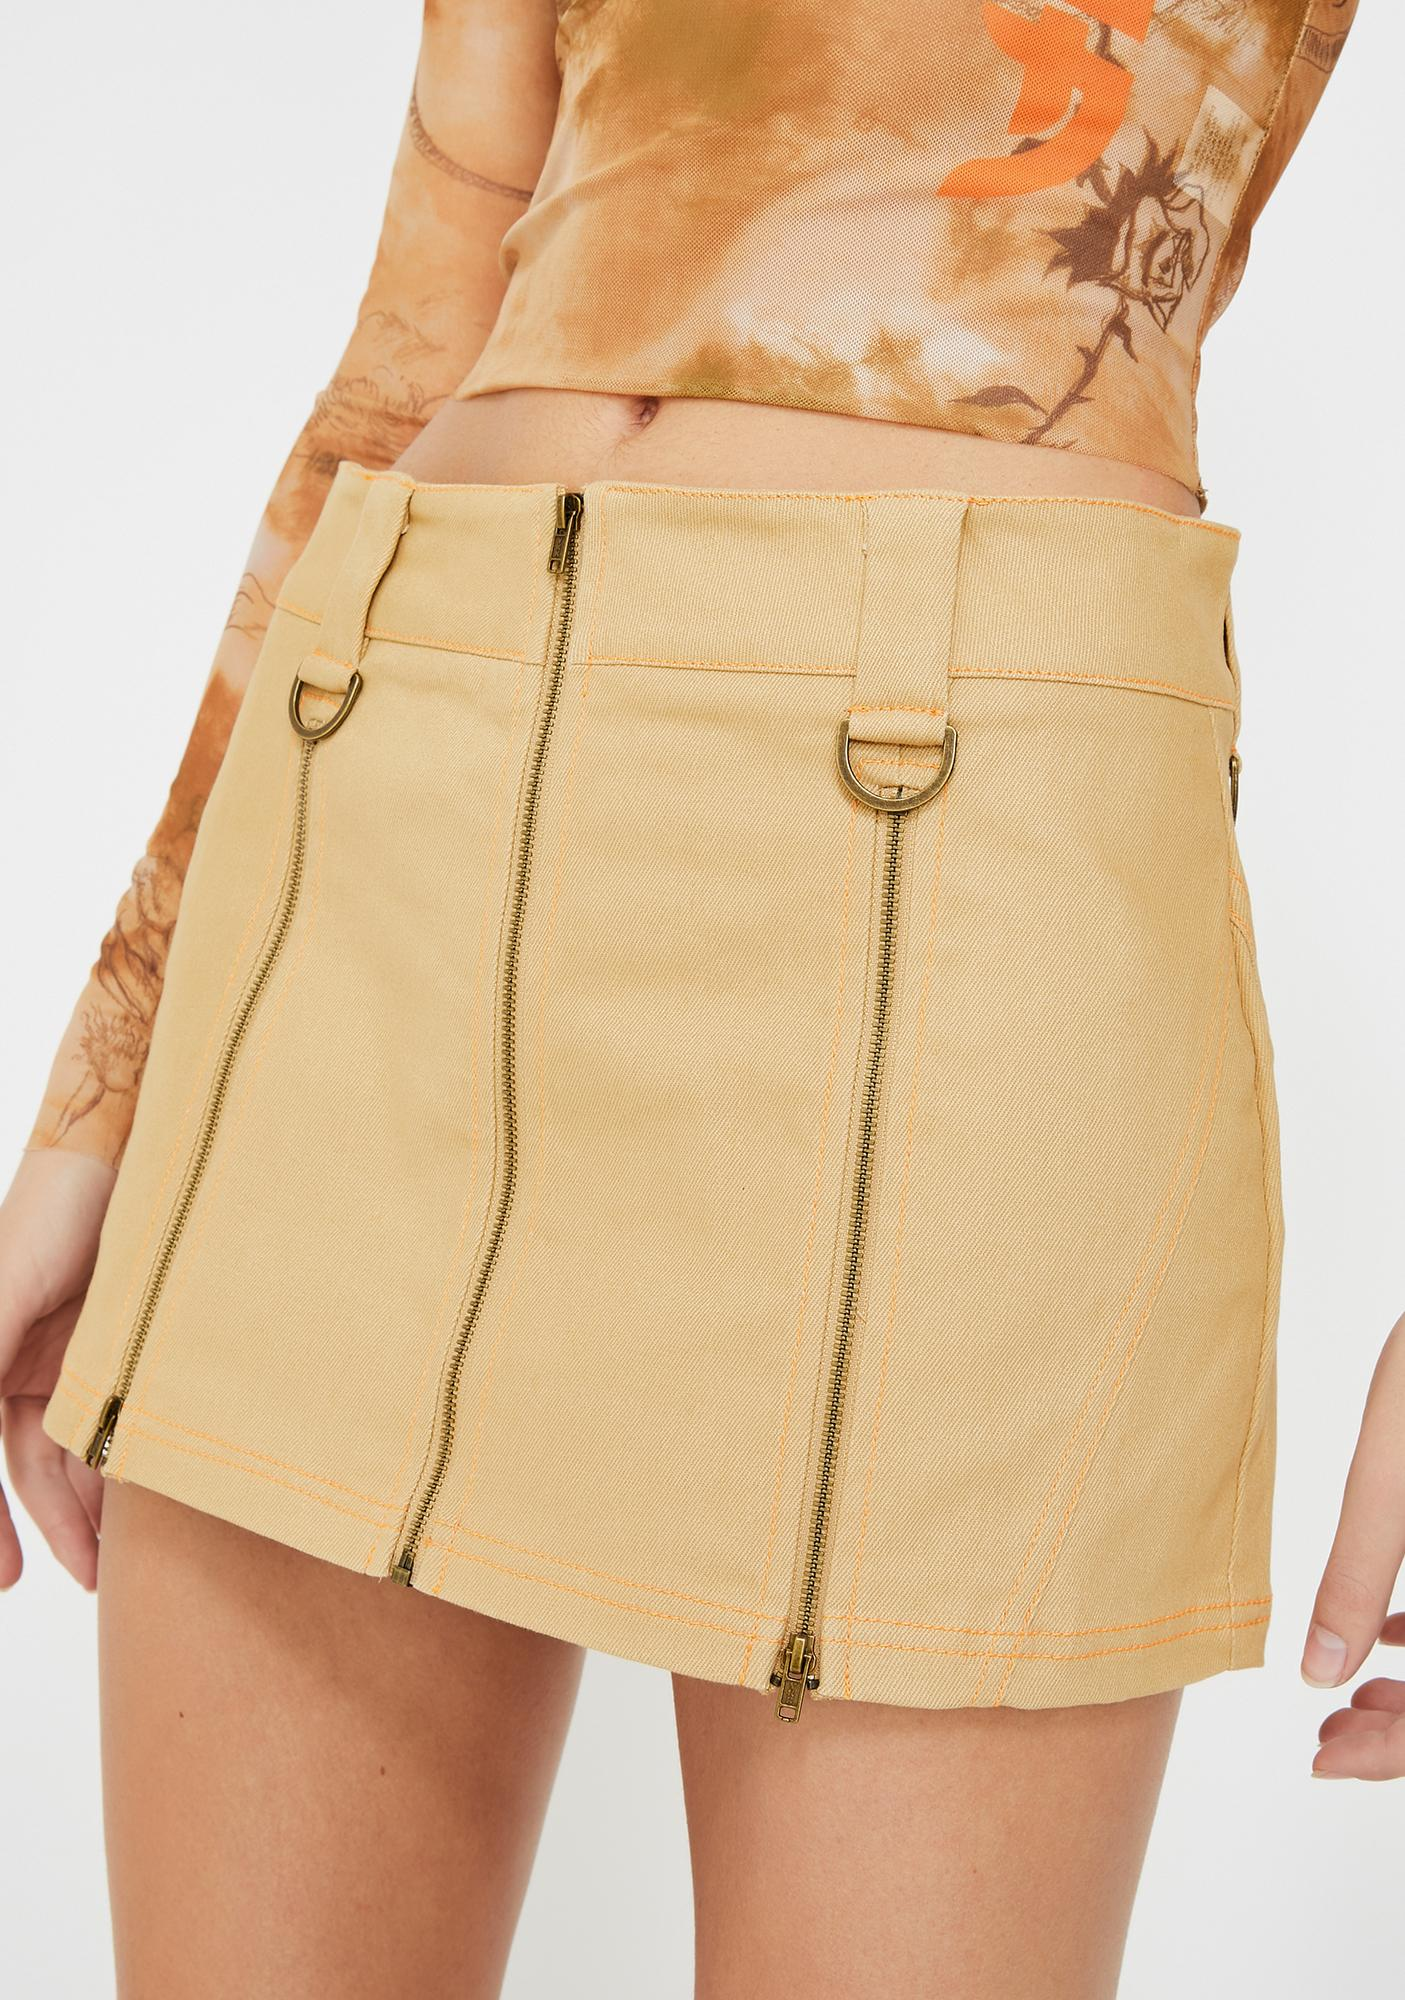 I AM GIA Maci Mini Skirt